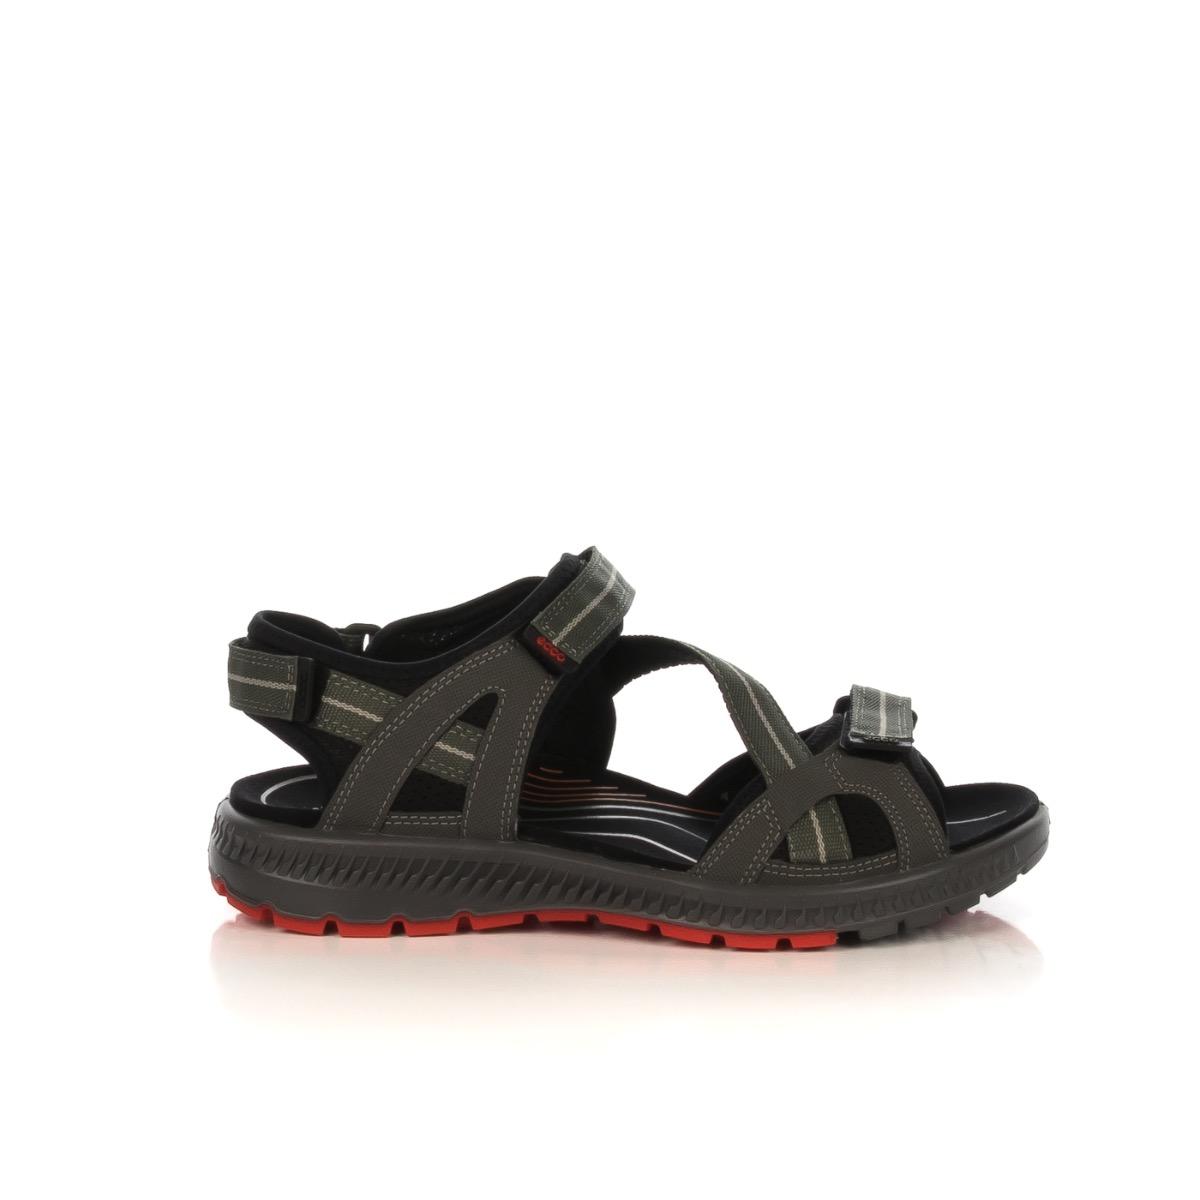 Online Uomo Da F76gyby Center Shopping Shoe Sandali Treviso n8w0PkO